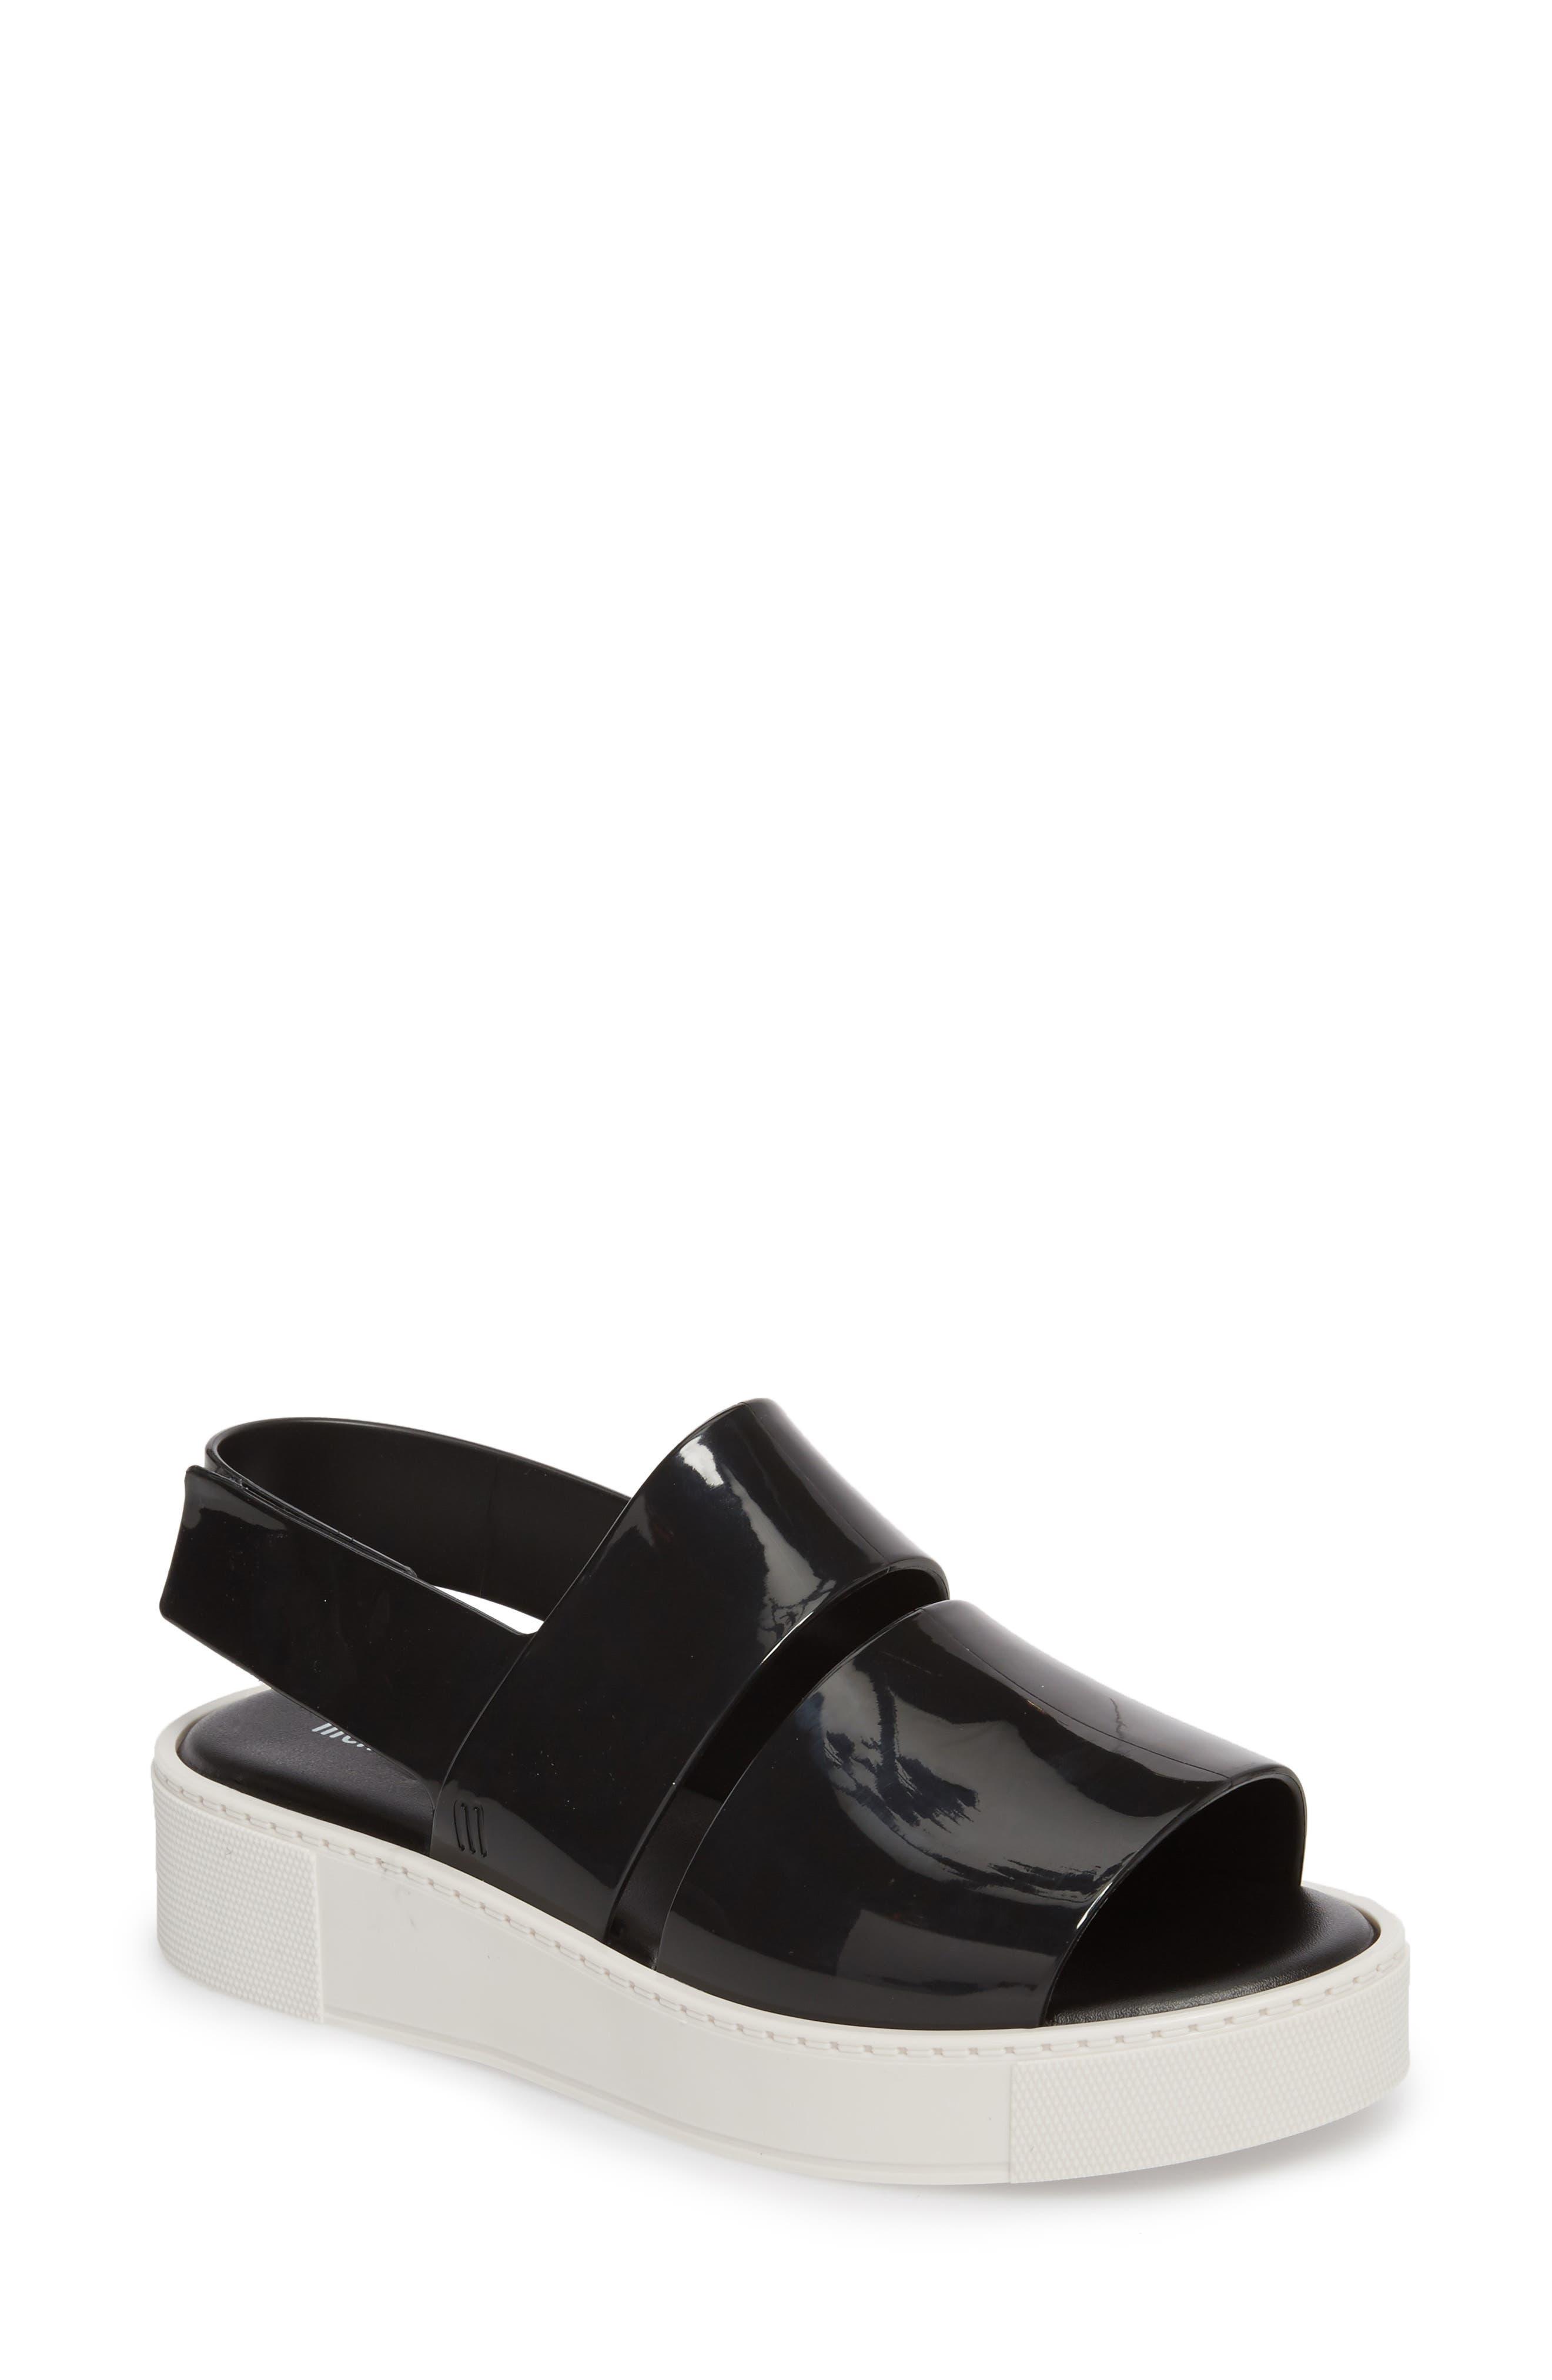 Soho Platform Sandal,                         Main,                         color, 001